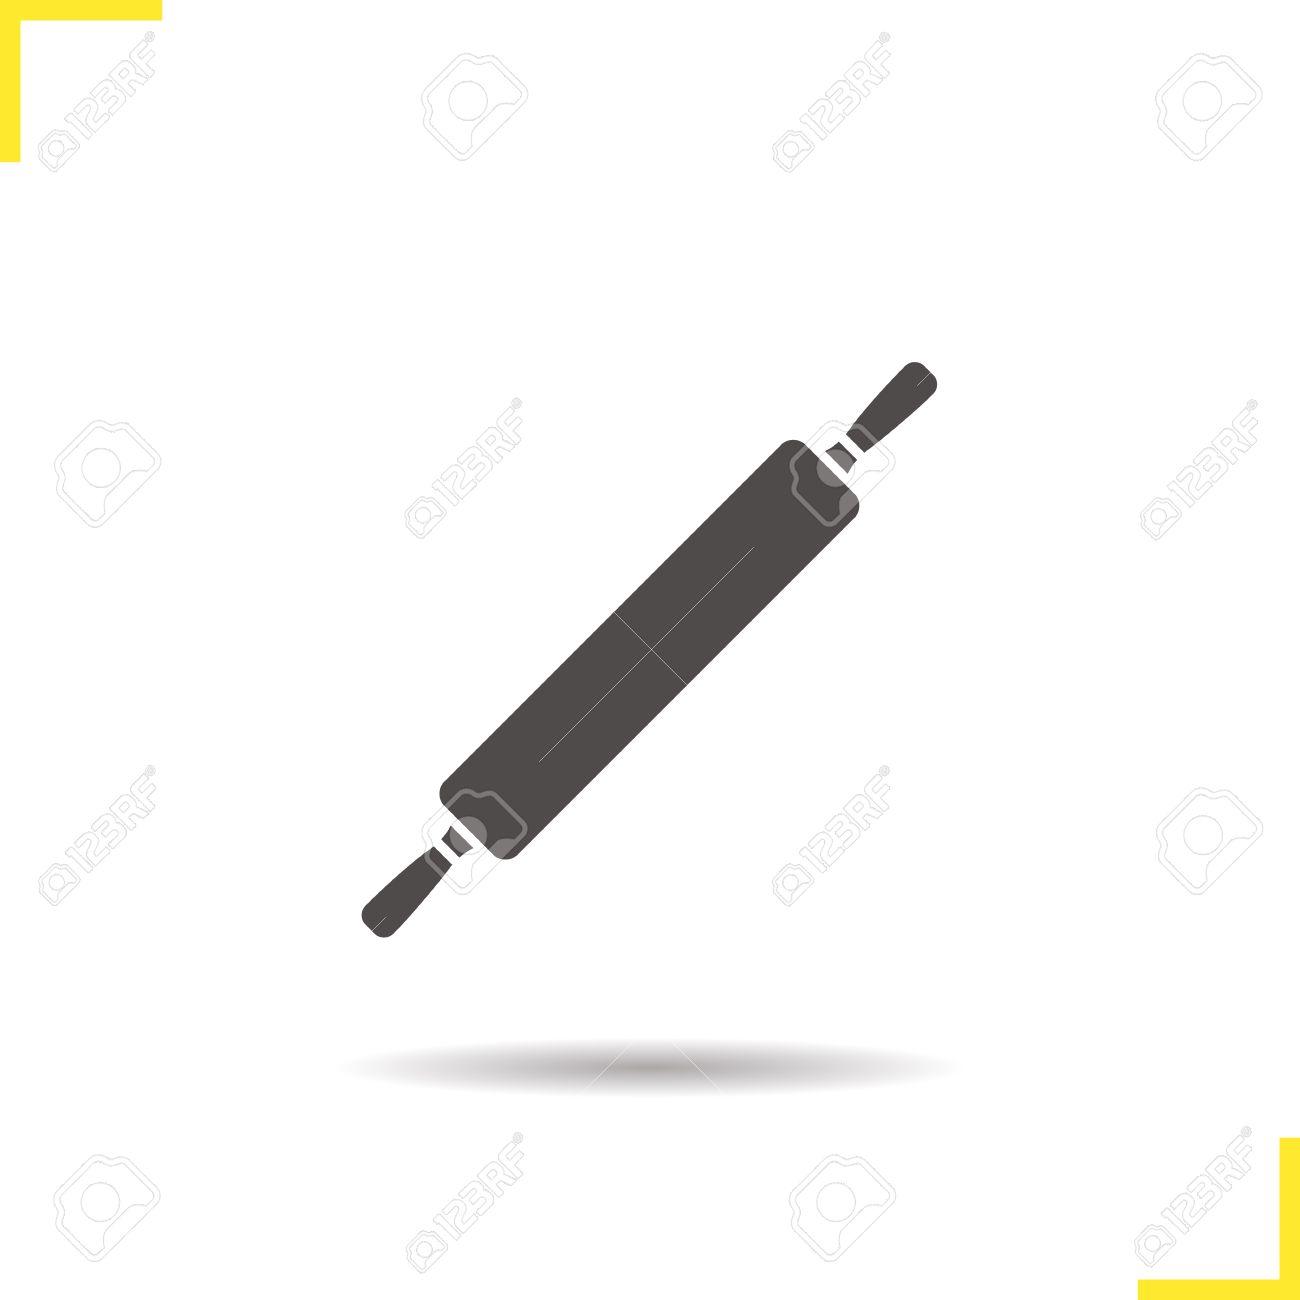 Icona Mattarello. Ombra Di Rotolamento Sagoma Pin Simbolo ...